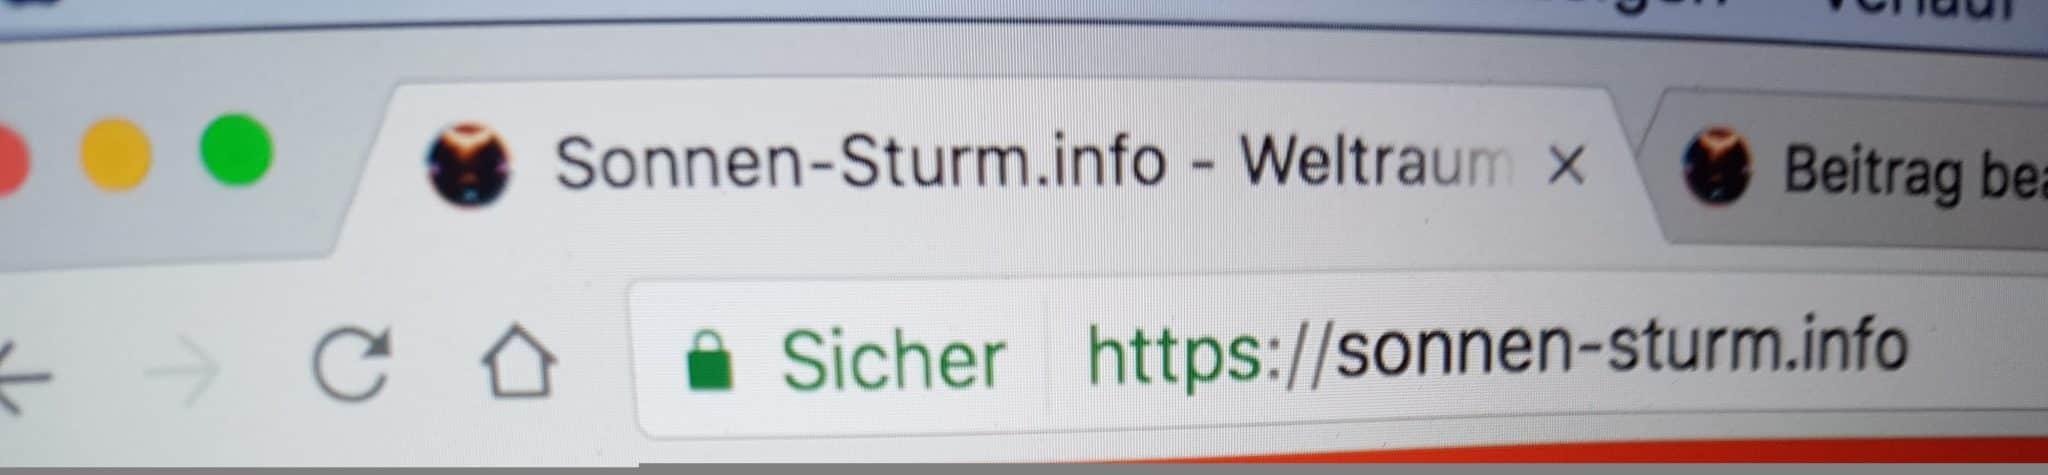 HTTPS Umstellung